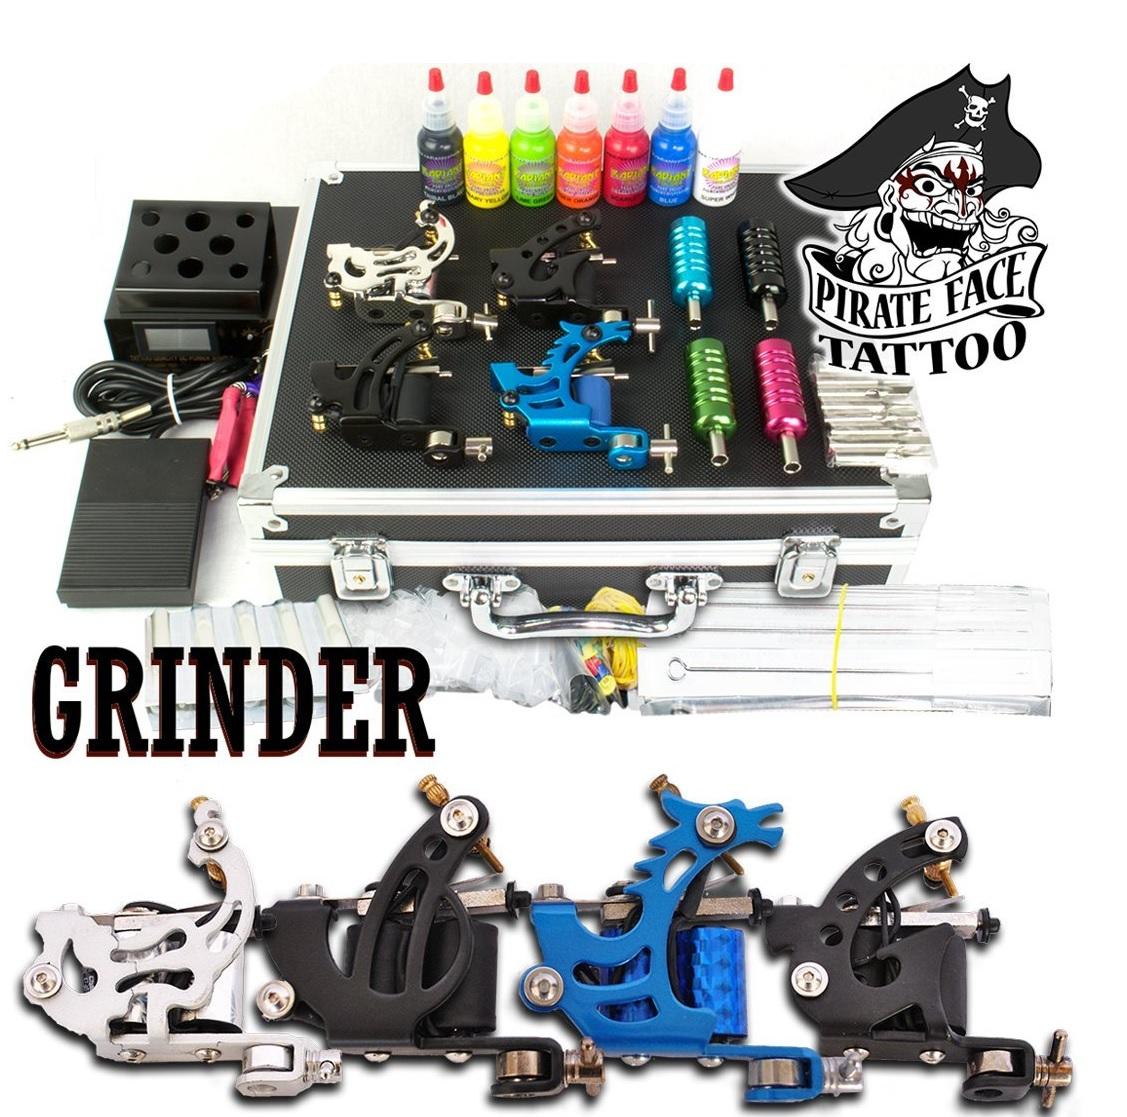 4 Gun Machine Tattoo Starter Kit for $99.99